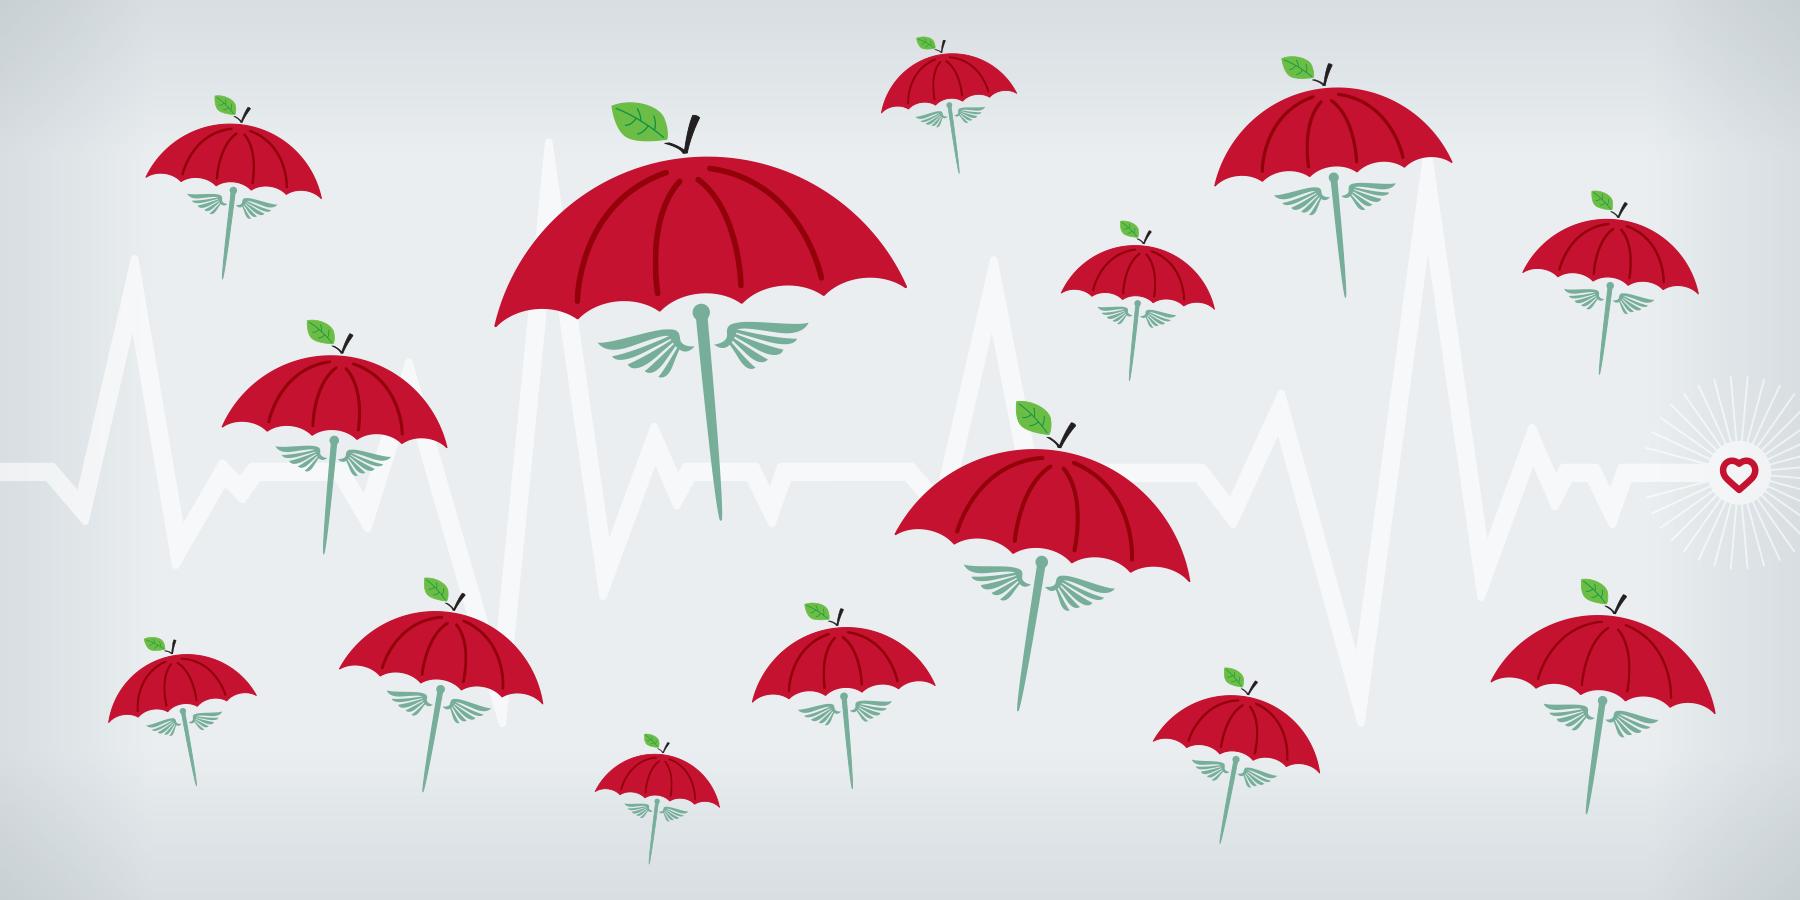 jkdc_appleseed-illustration_healthcare.png